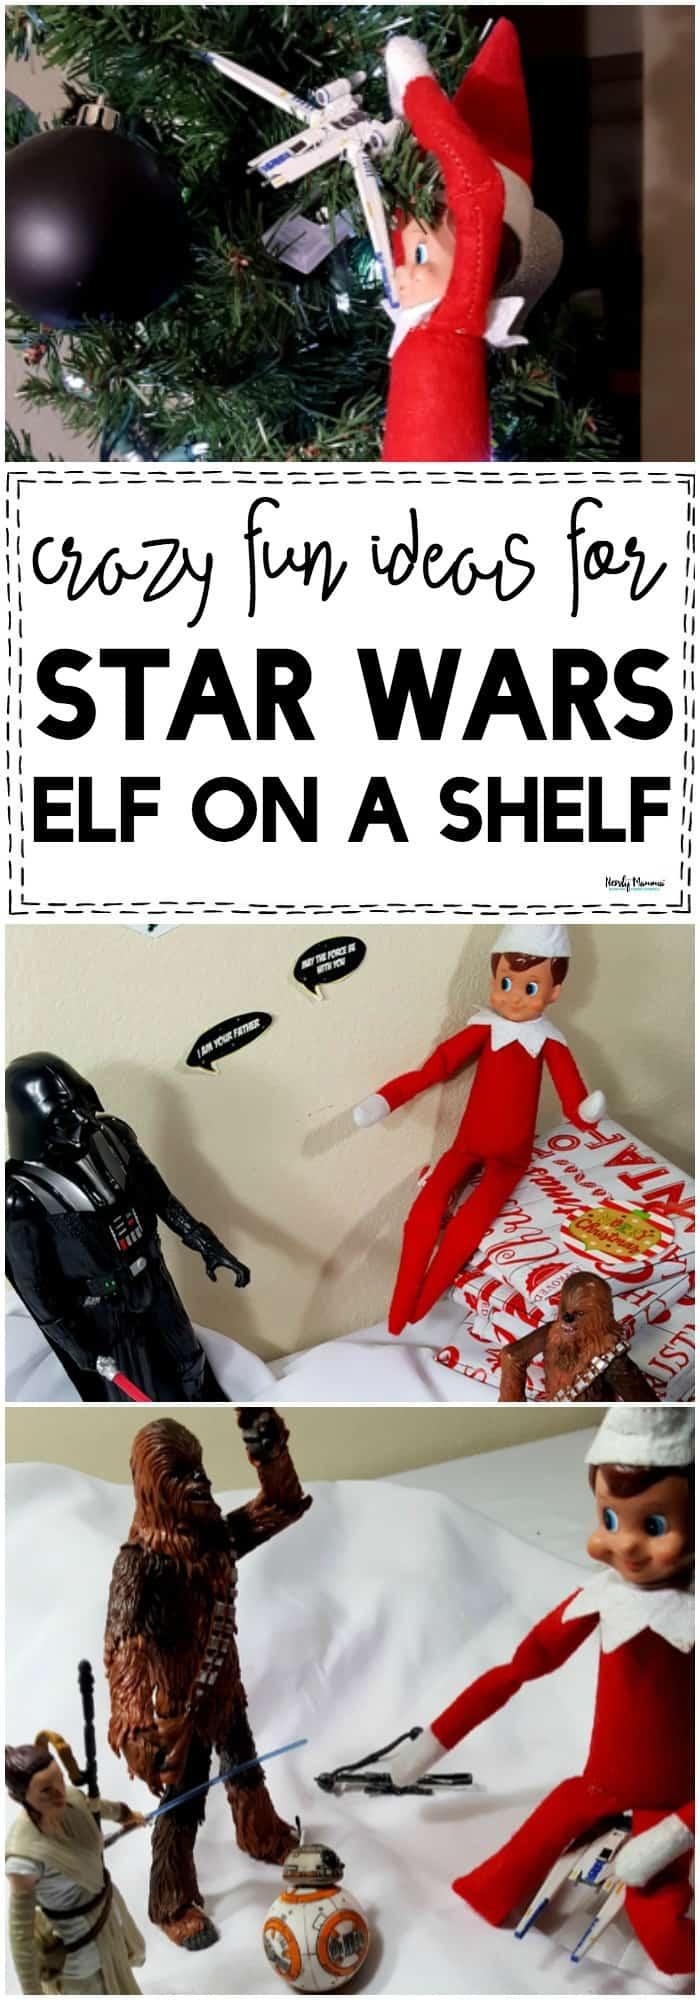 You've GOT to check out these super adorable Star Wars Elf on a Shelf ideas! #StarWars #ElfonaShelf #Christmas #KidsActivities #Activities #ElfIdeas #ElfonaShelfIdeas